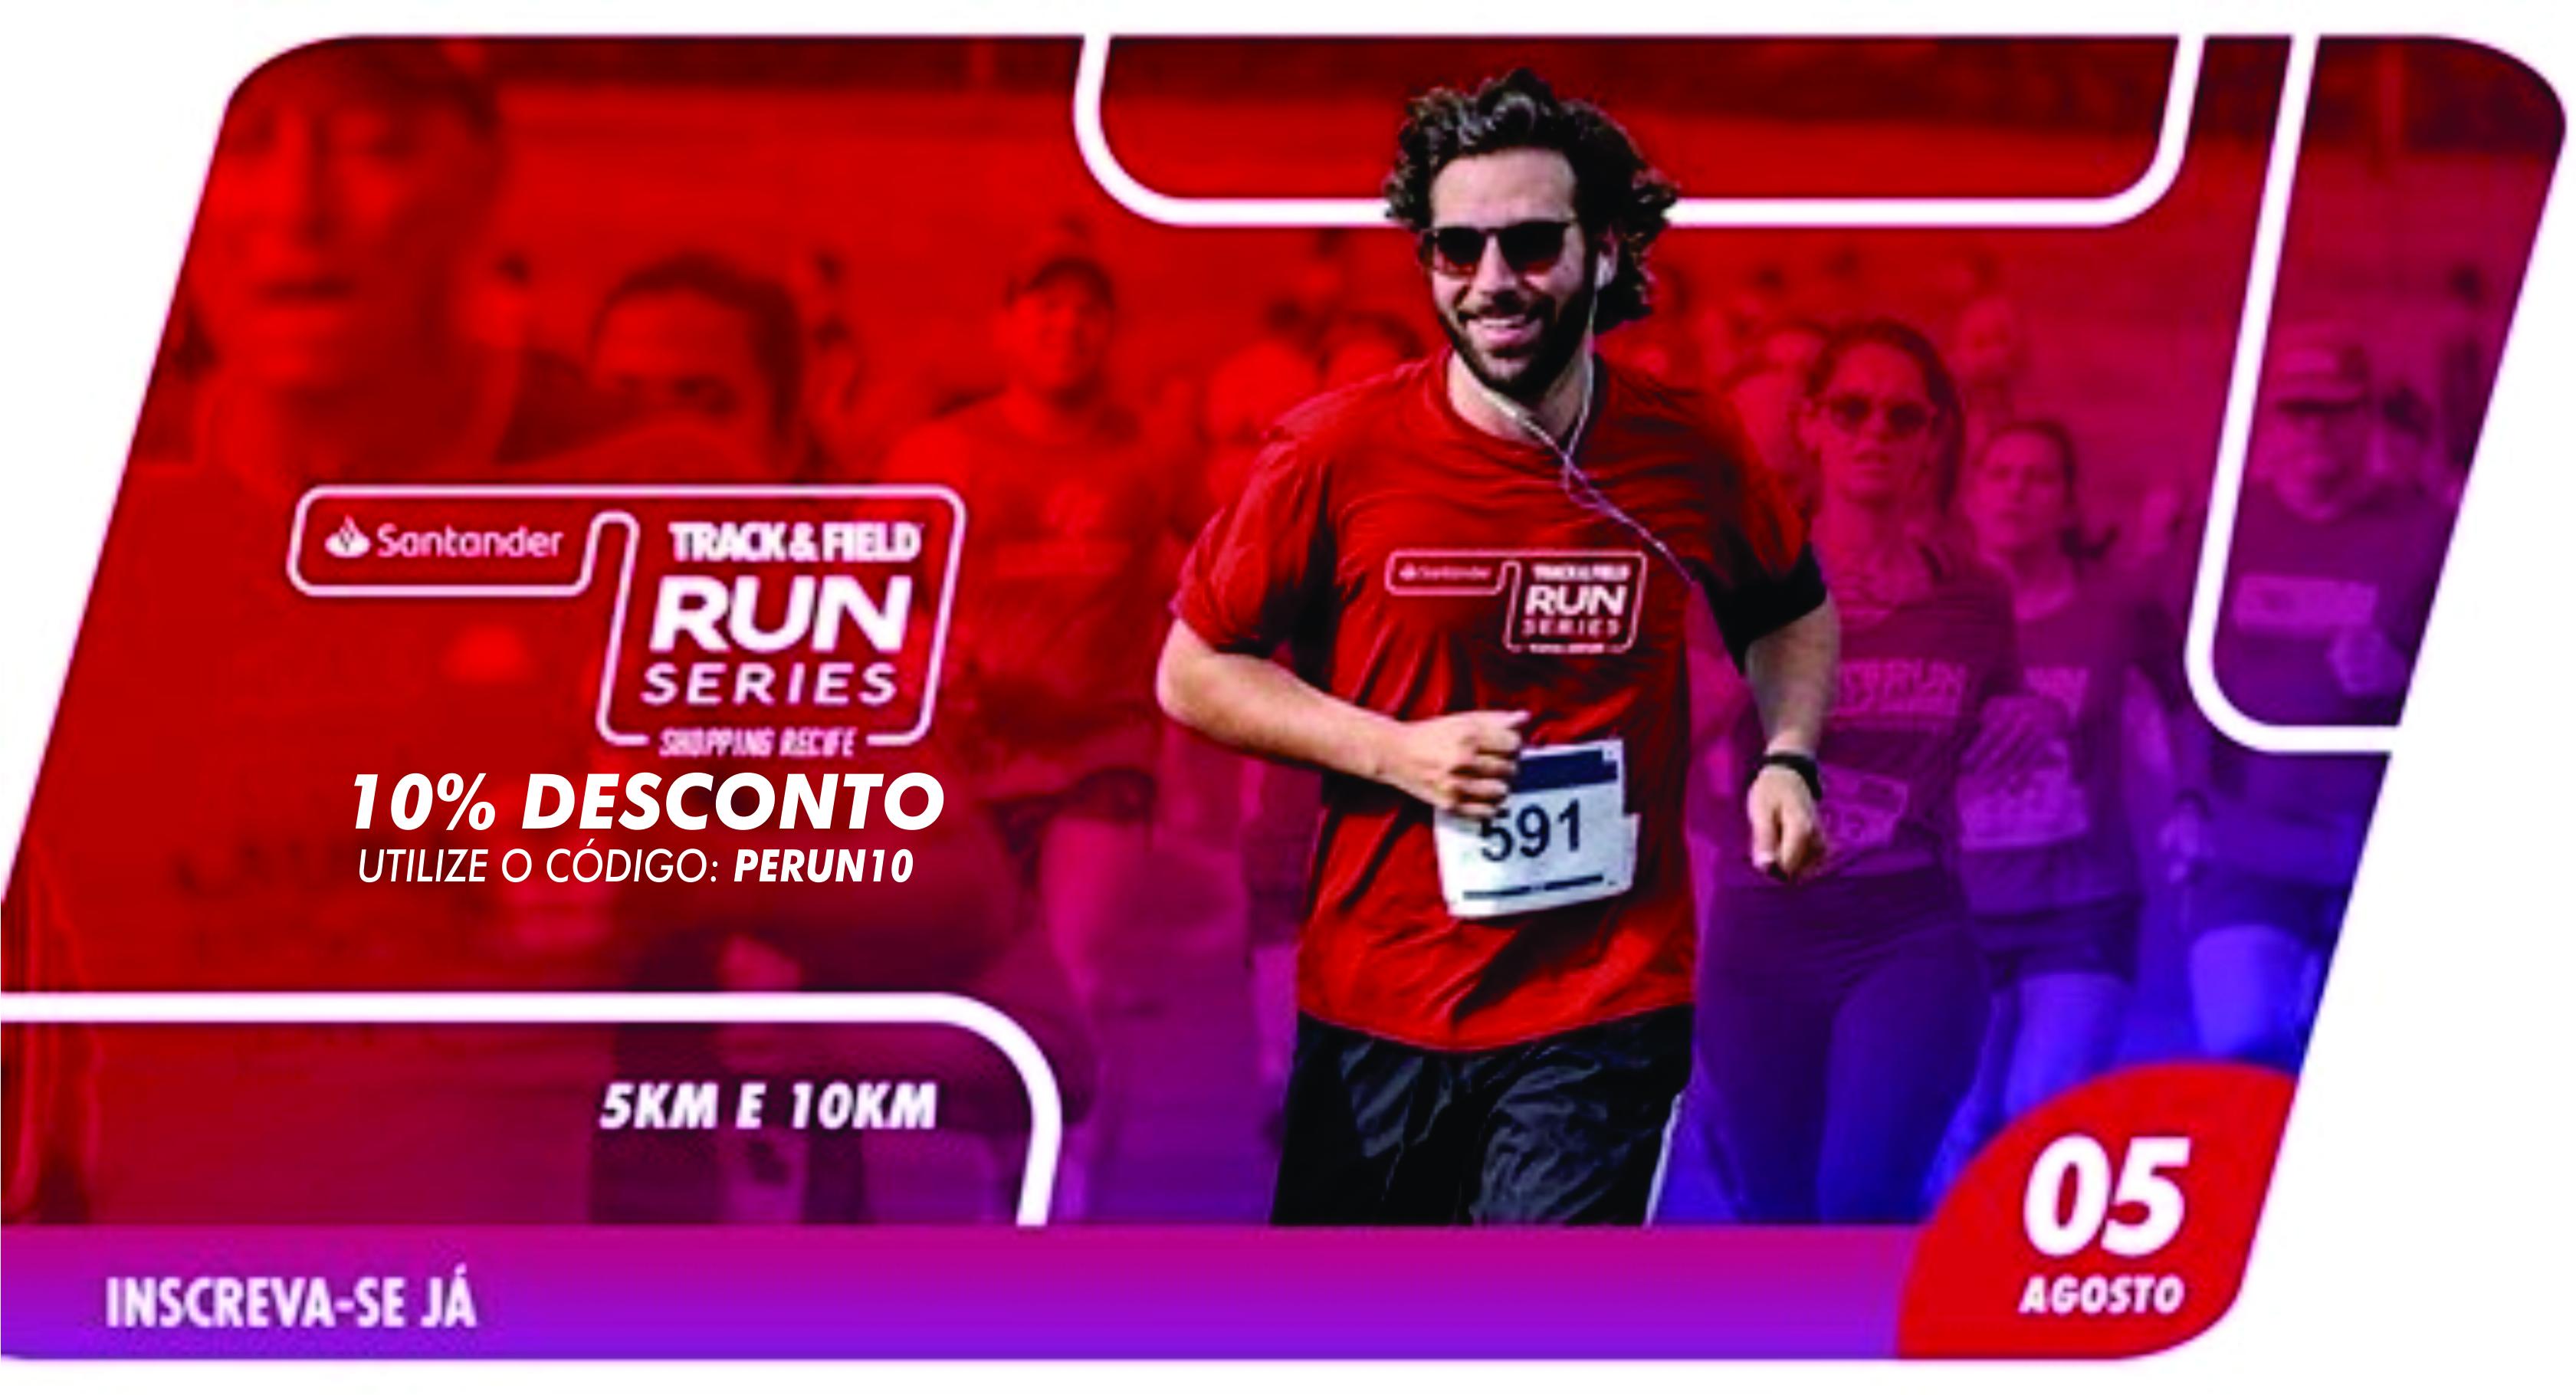 83b467680b45 SANTANDER TRACK&FIELD RUN SERIES SHOPPING RECIFE   :: Pernambuco Running ::